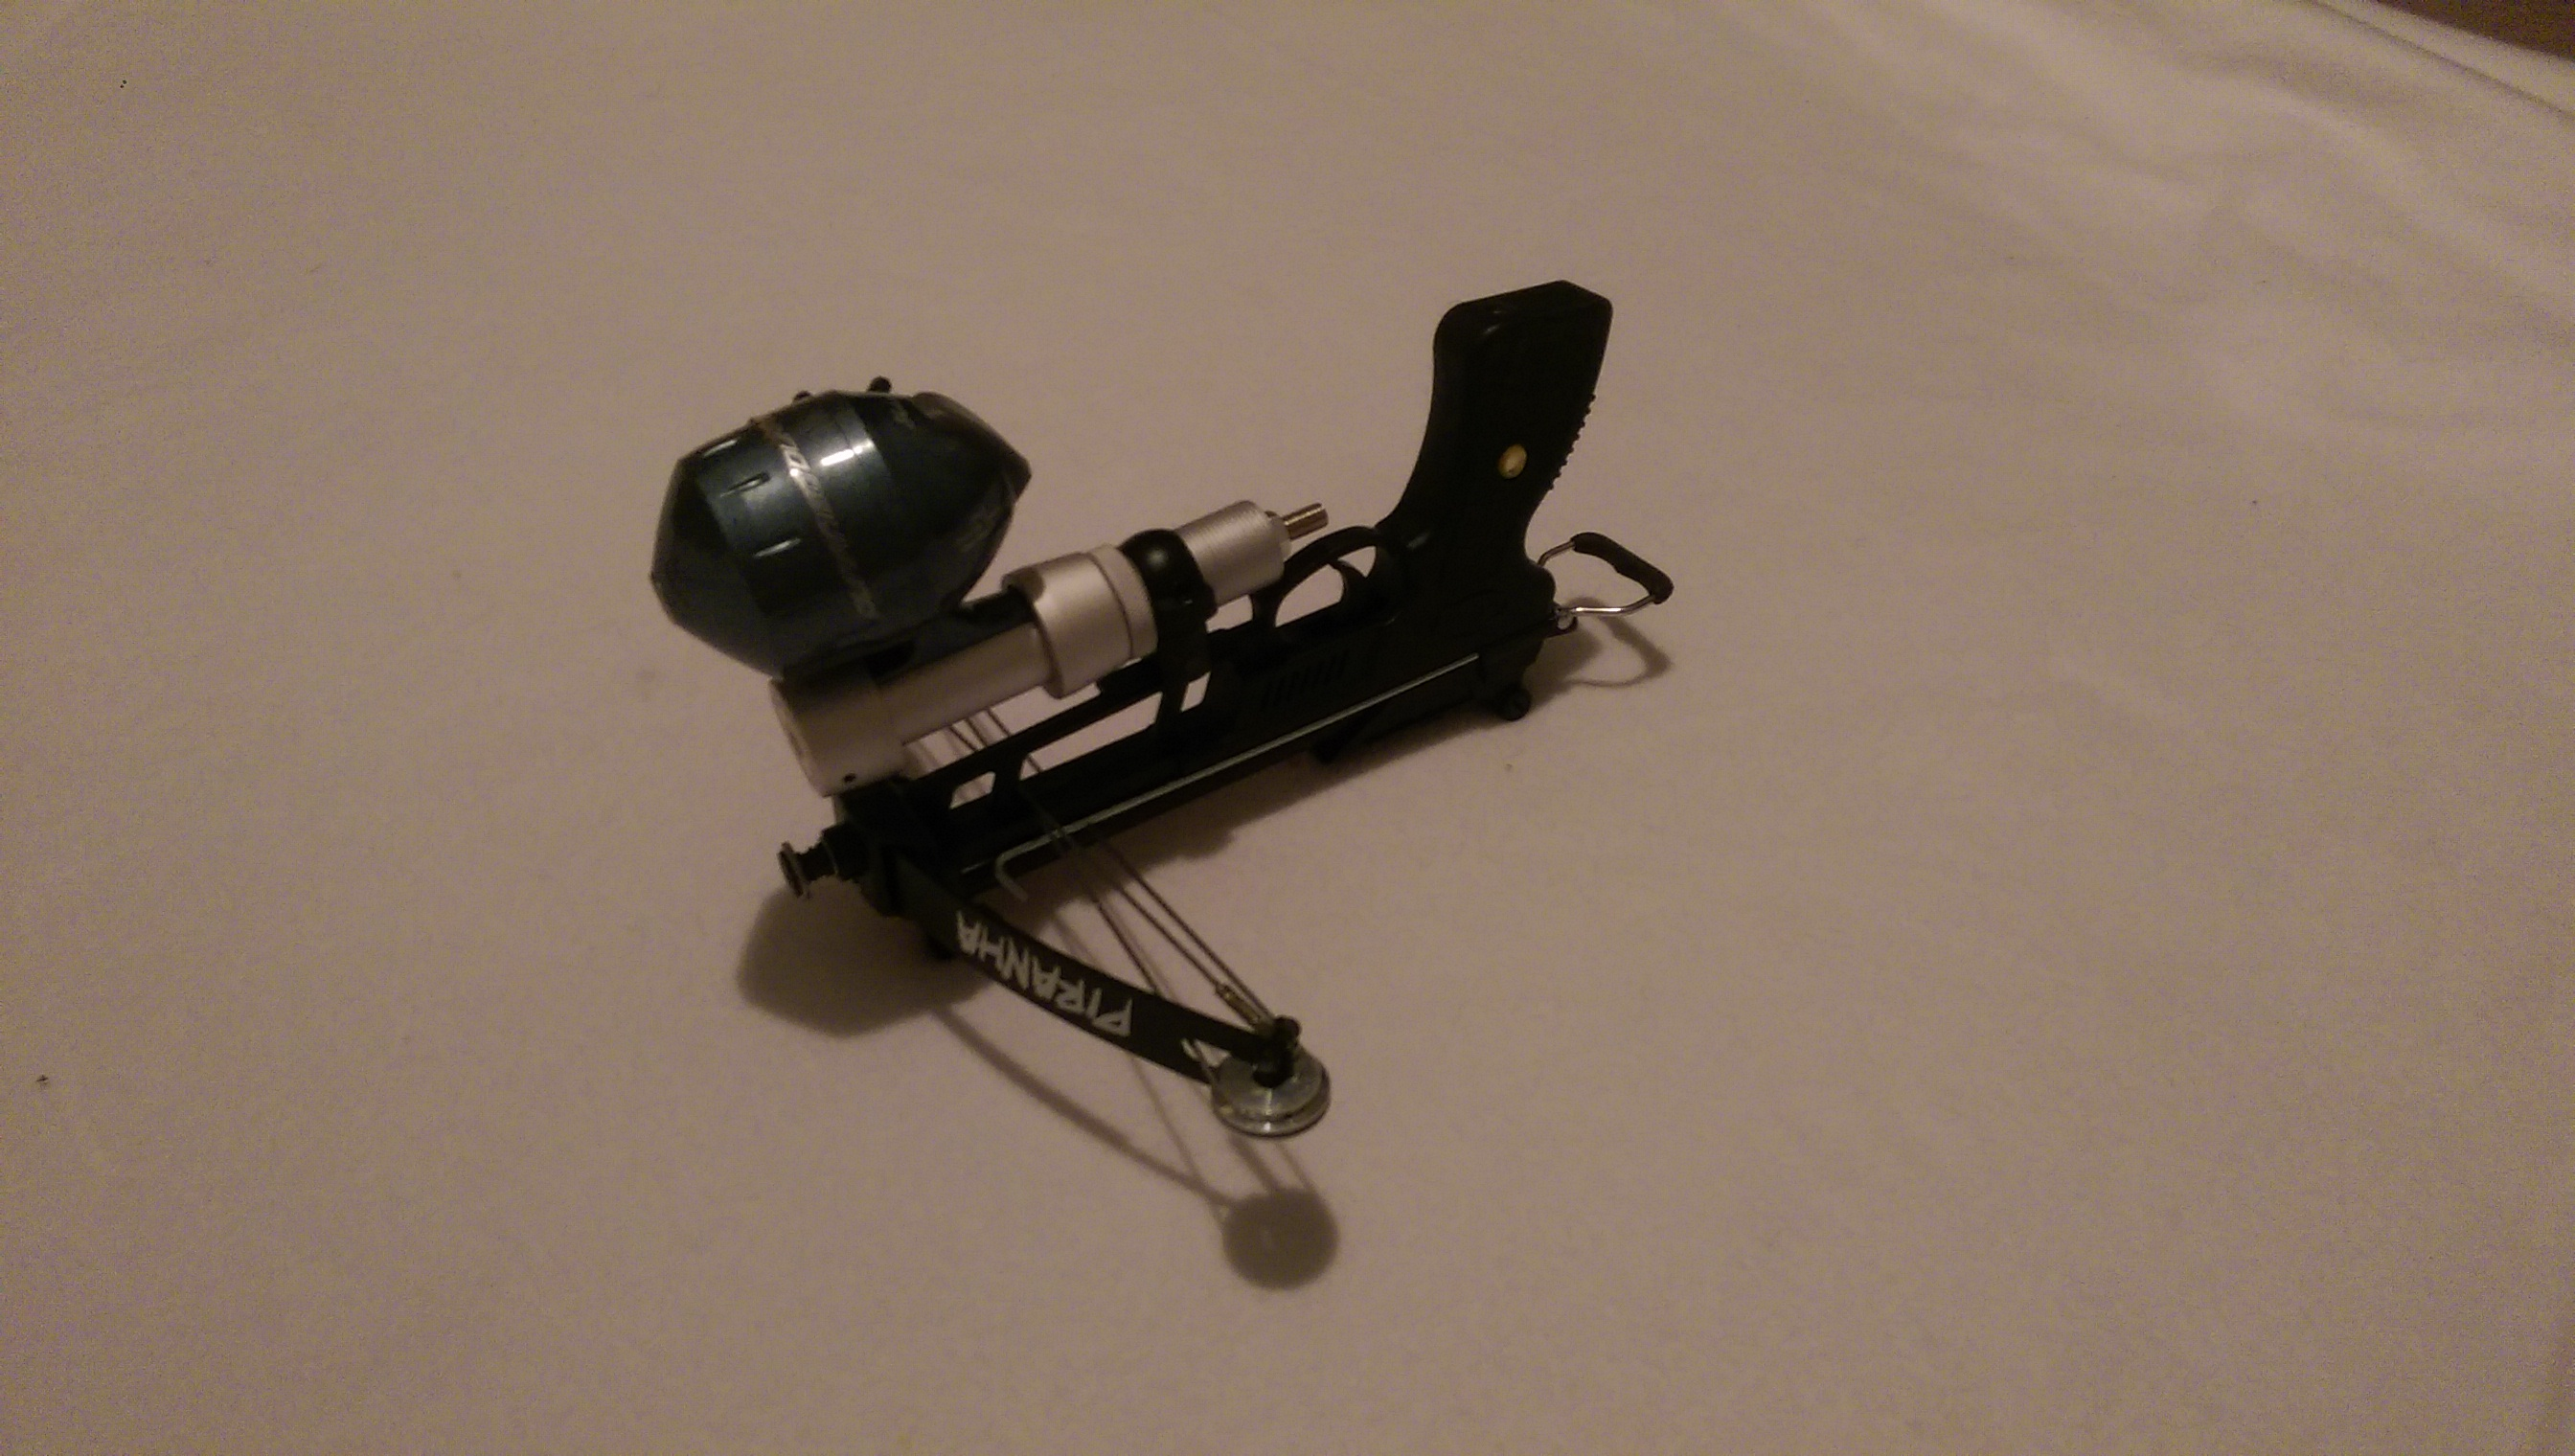 William tell archery supplies wt piranha multifunctional for Mini crossbow fishing